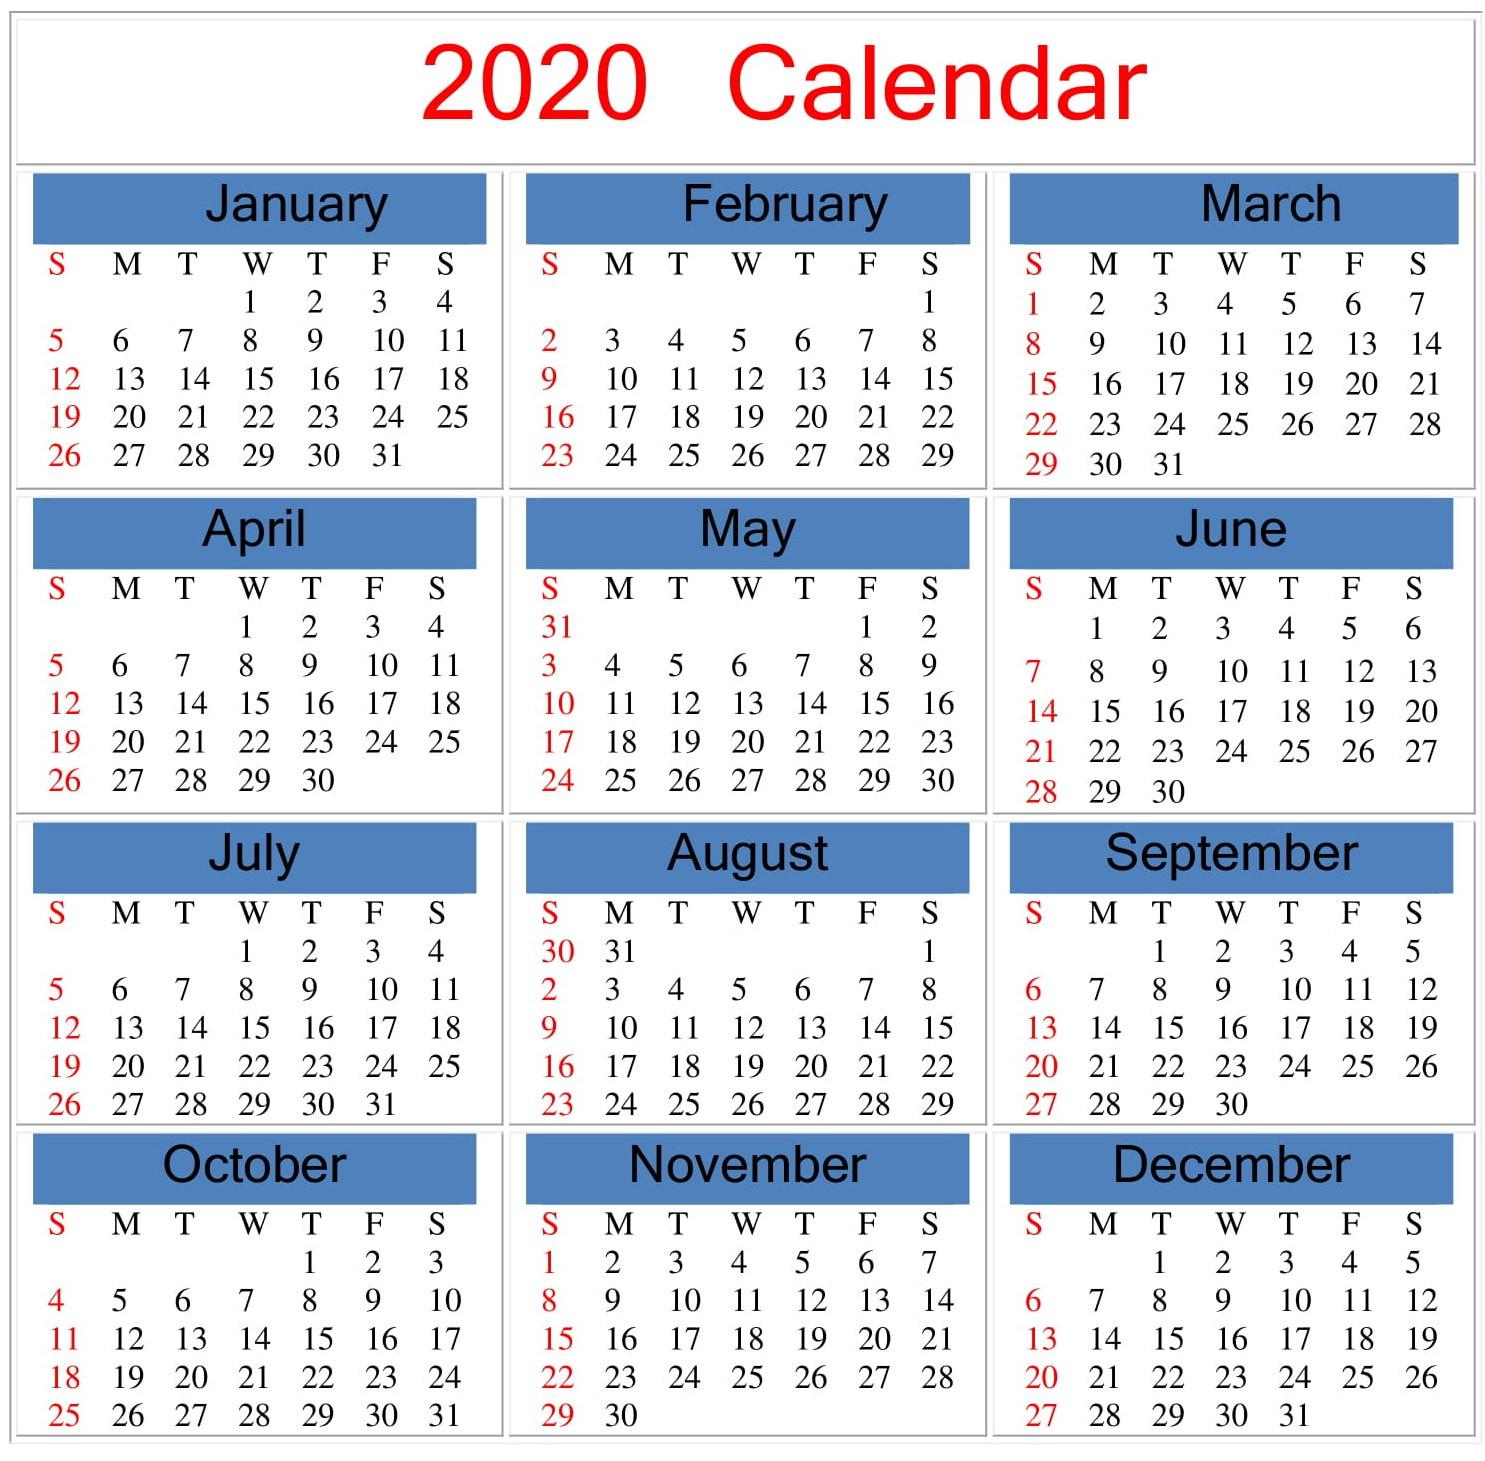 Get Julian Date For October 2020 | Calendar Printables  When Is The Peek Rut In Nobel County Ohio Prdicted